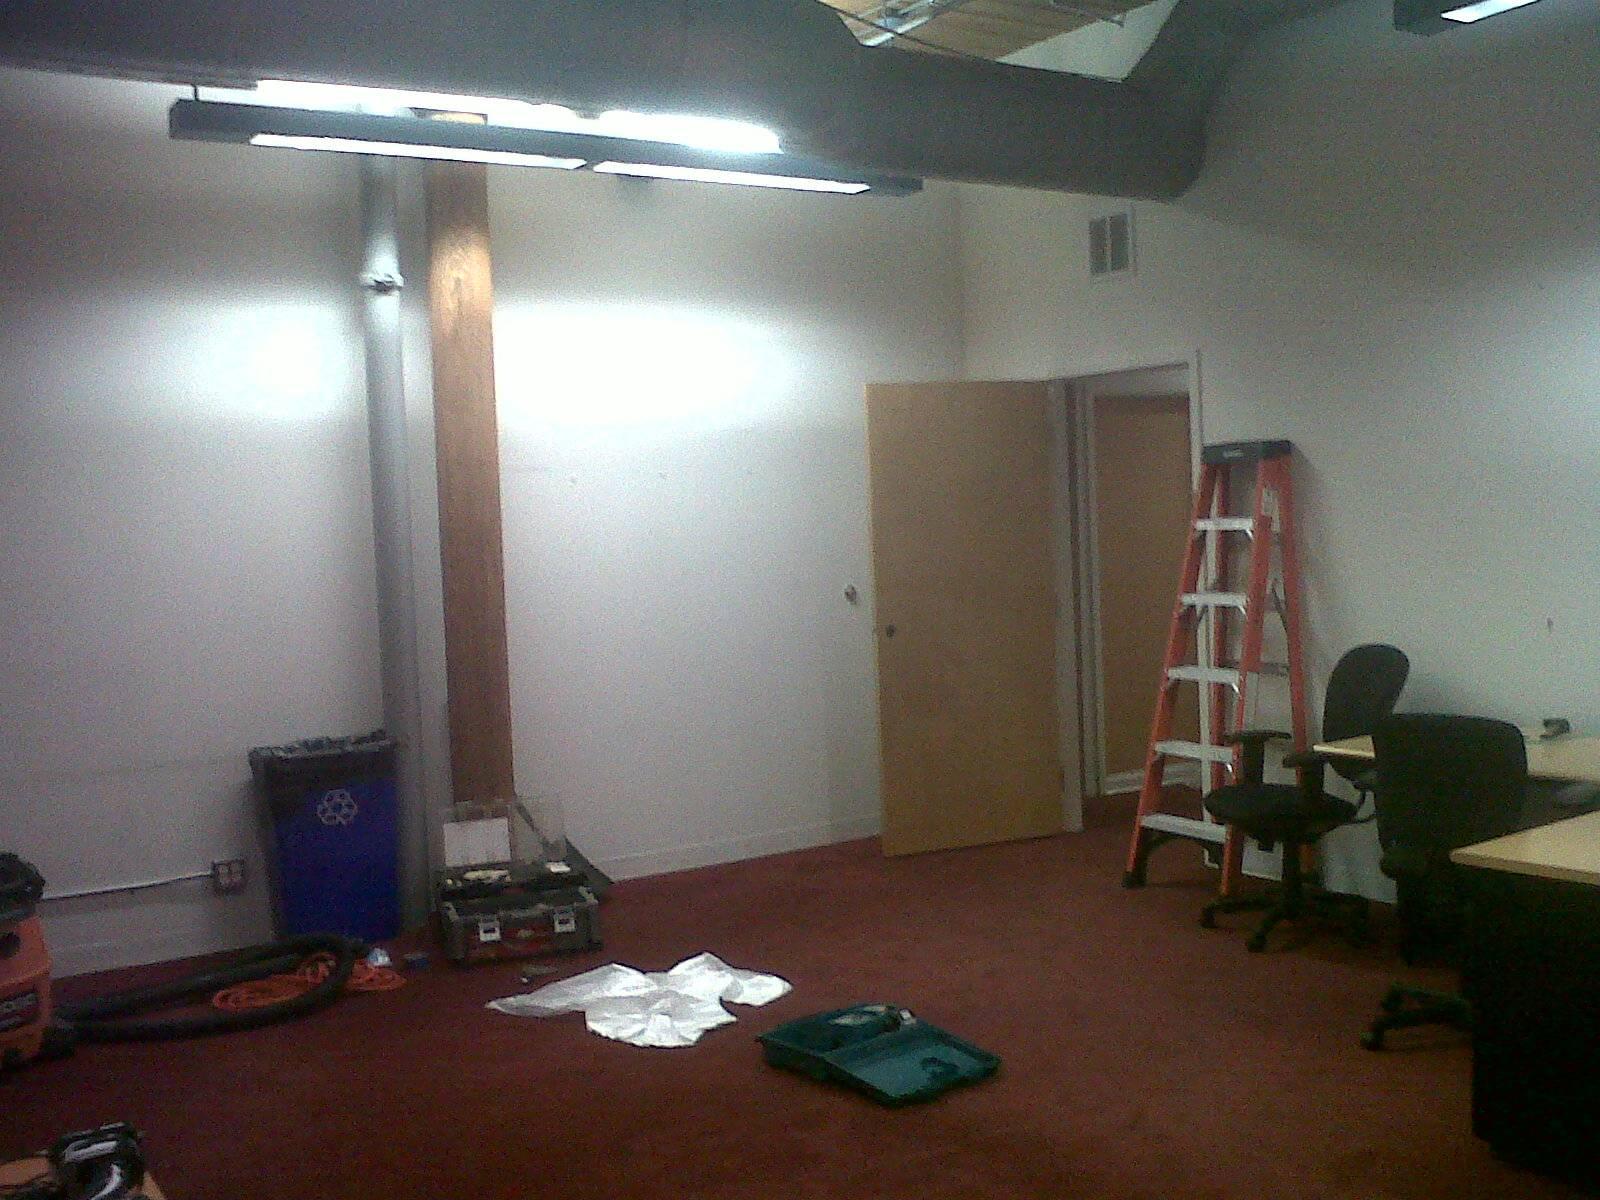 Before Image 1: Opening up Floor Plan